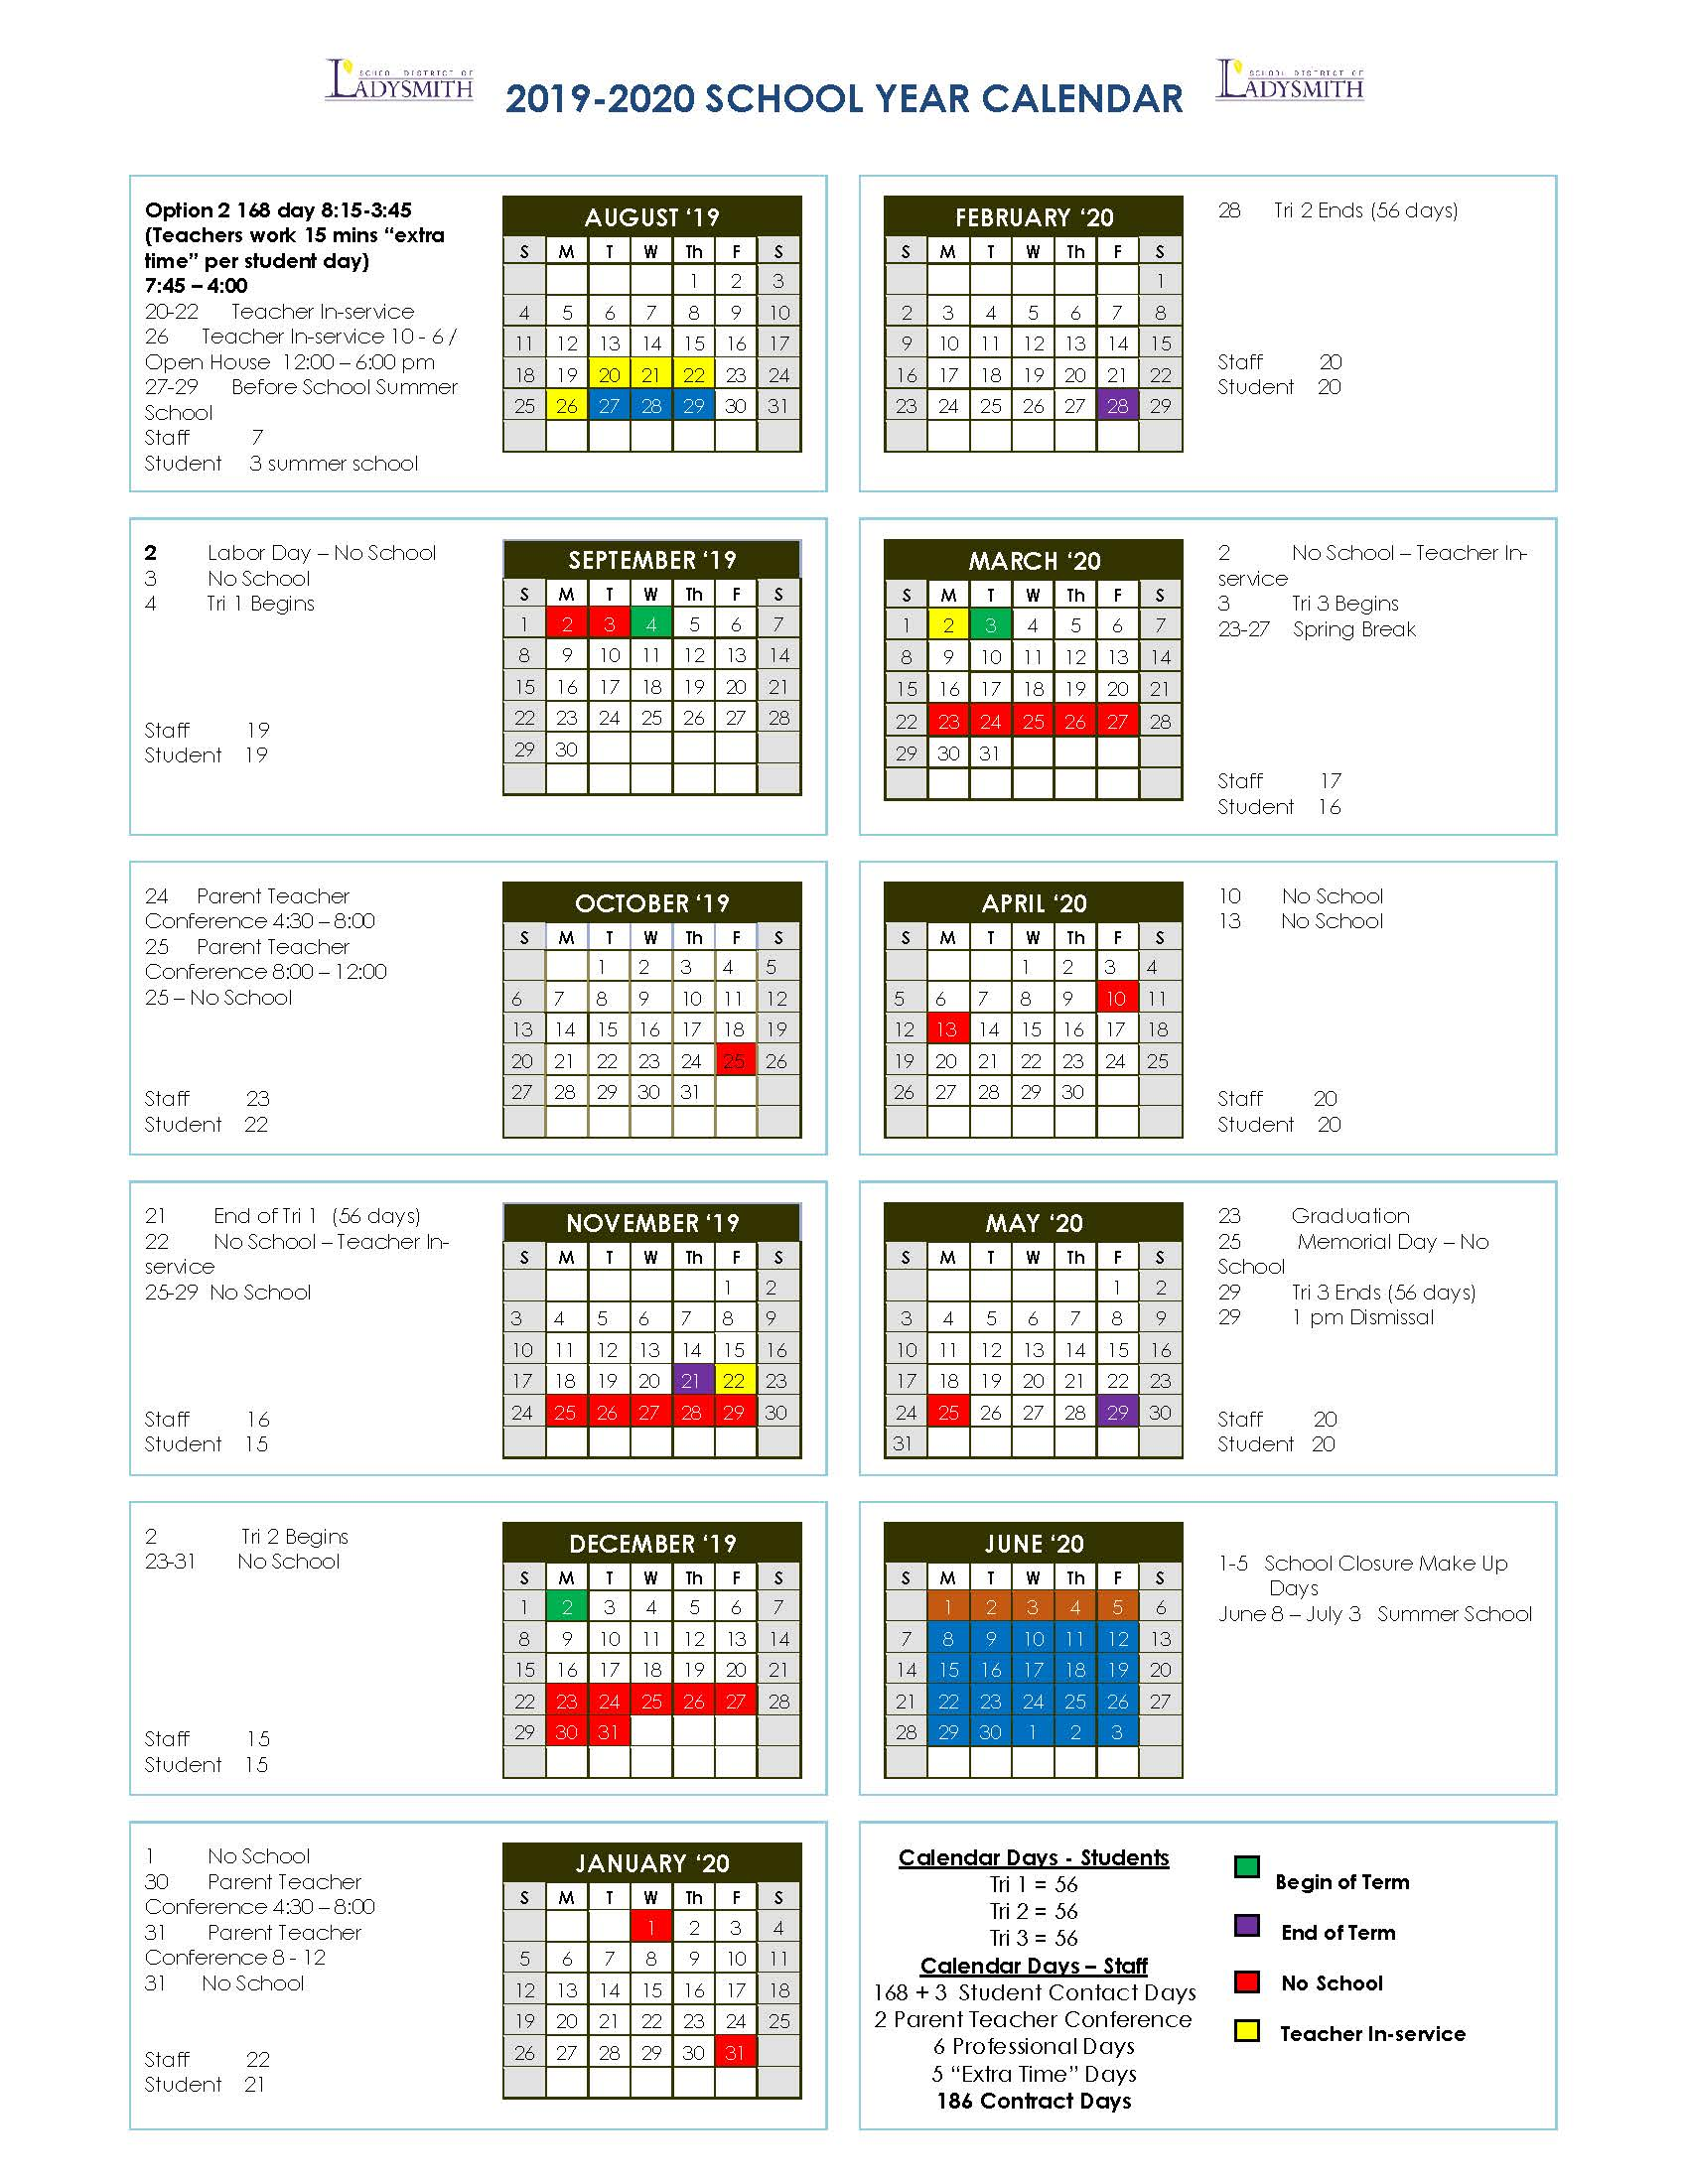 Ladysmith School District Calendar 2019 and 2020